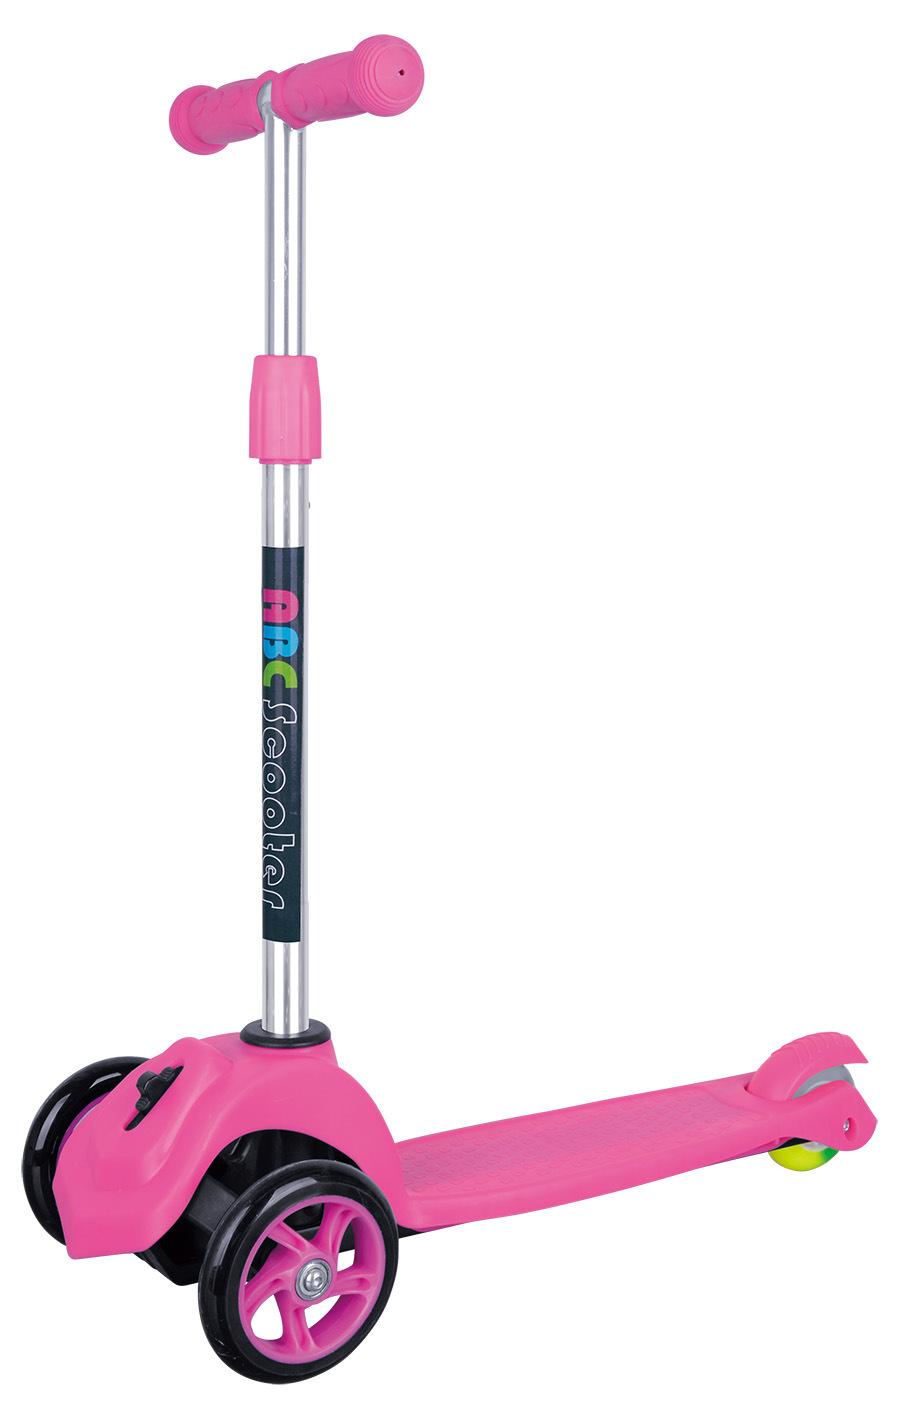 Tri-Wheel Adjustable Kick Scooter (GS-002D11)